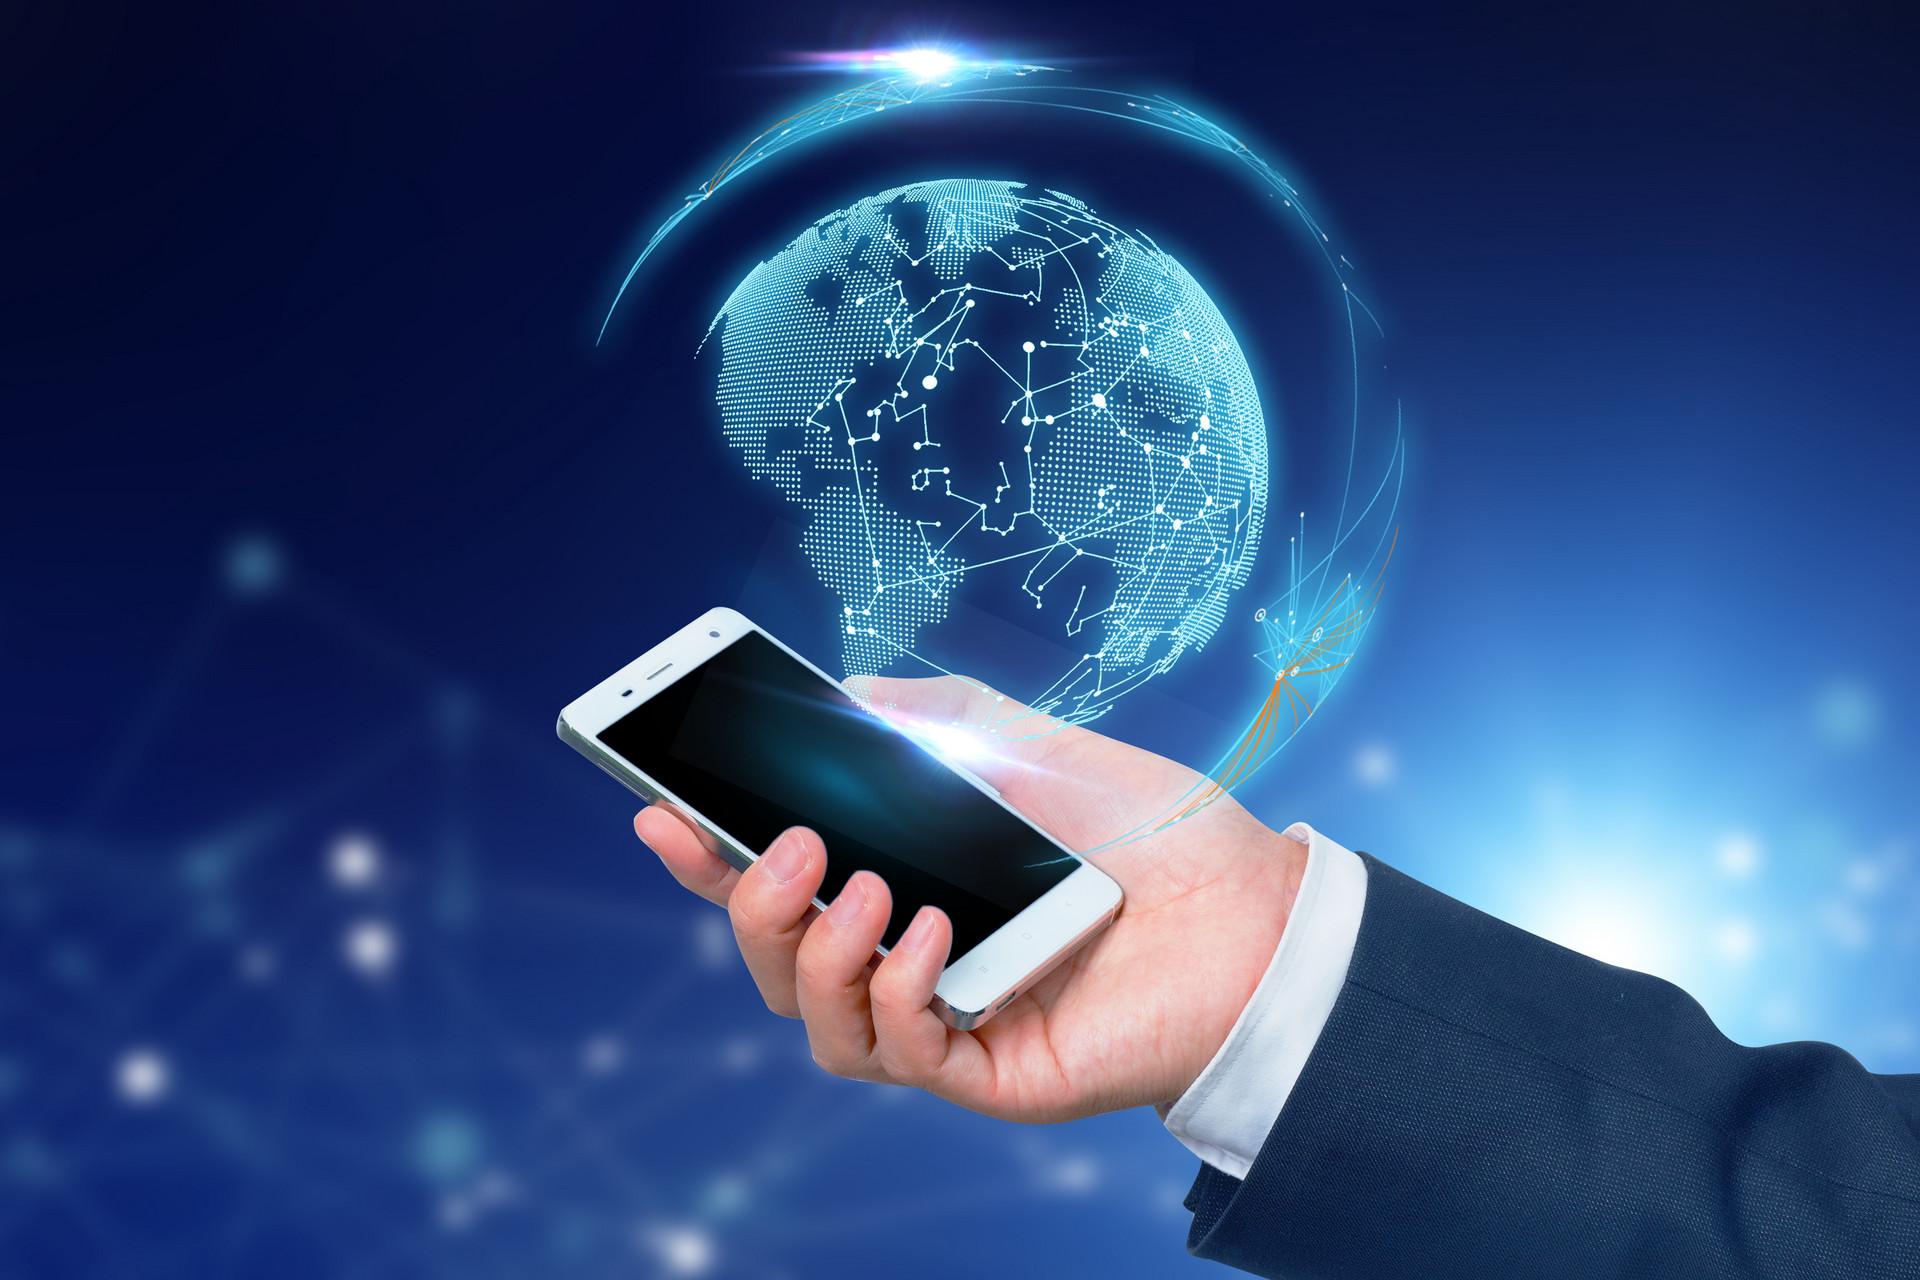 IDC 最新预测:智能手机将在下半年出现复苏迹象,明年恢复增长